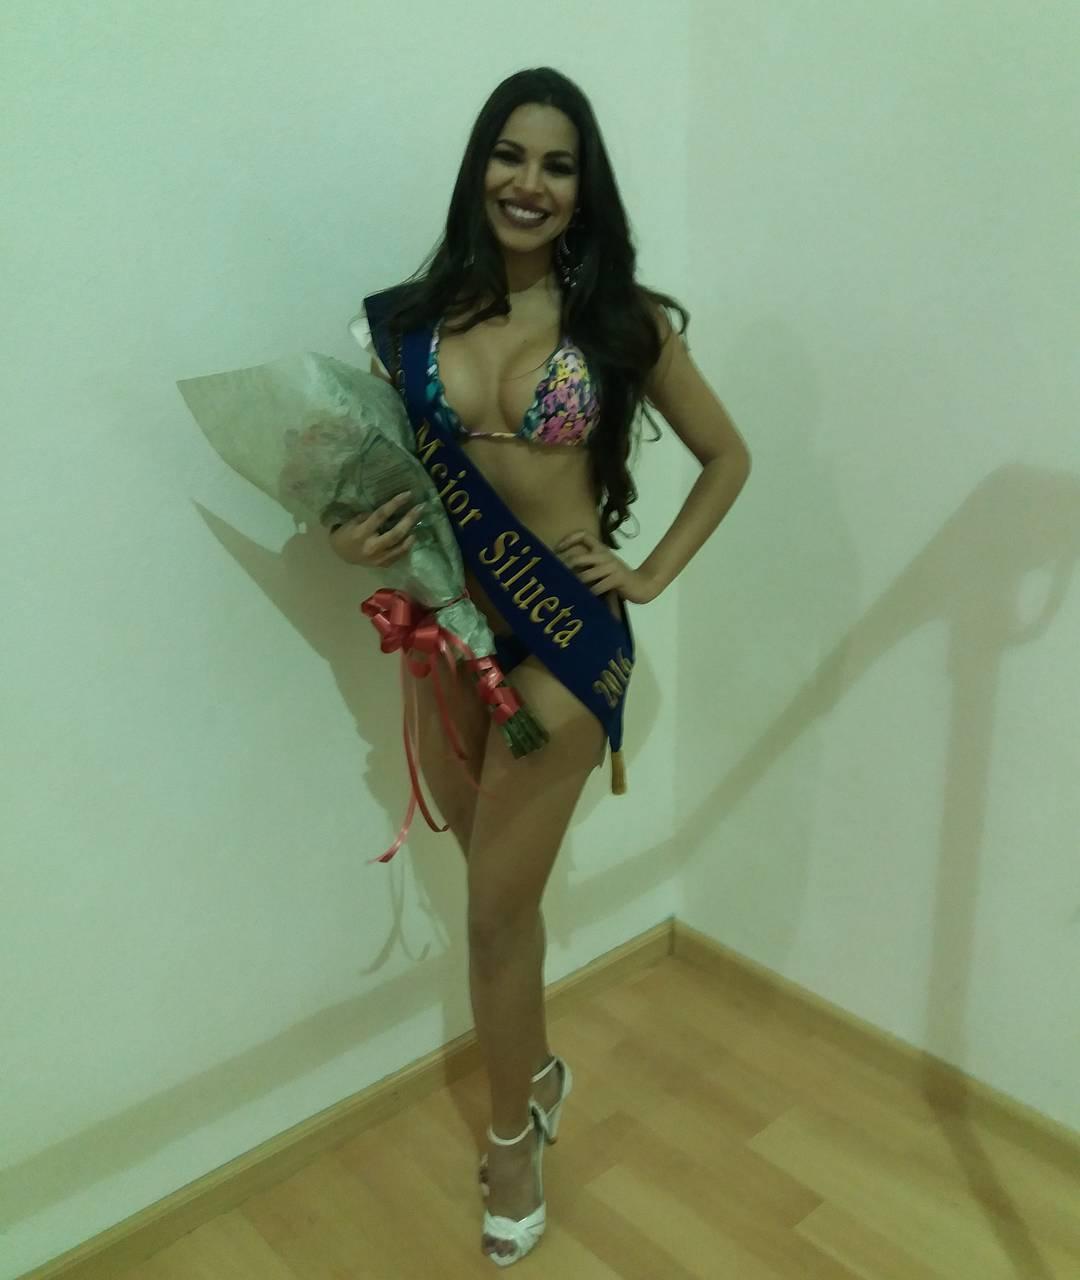 juliana pires, 3ra finalista de miss turismo latino 2016. - Página 2 Ieu5z99h